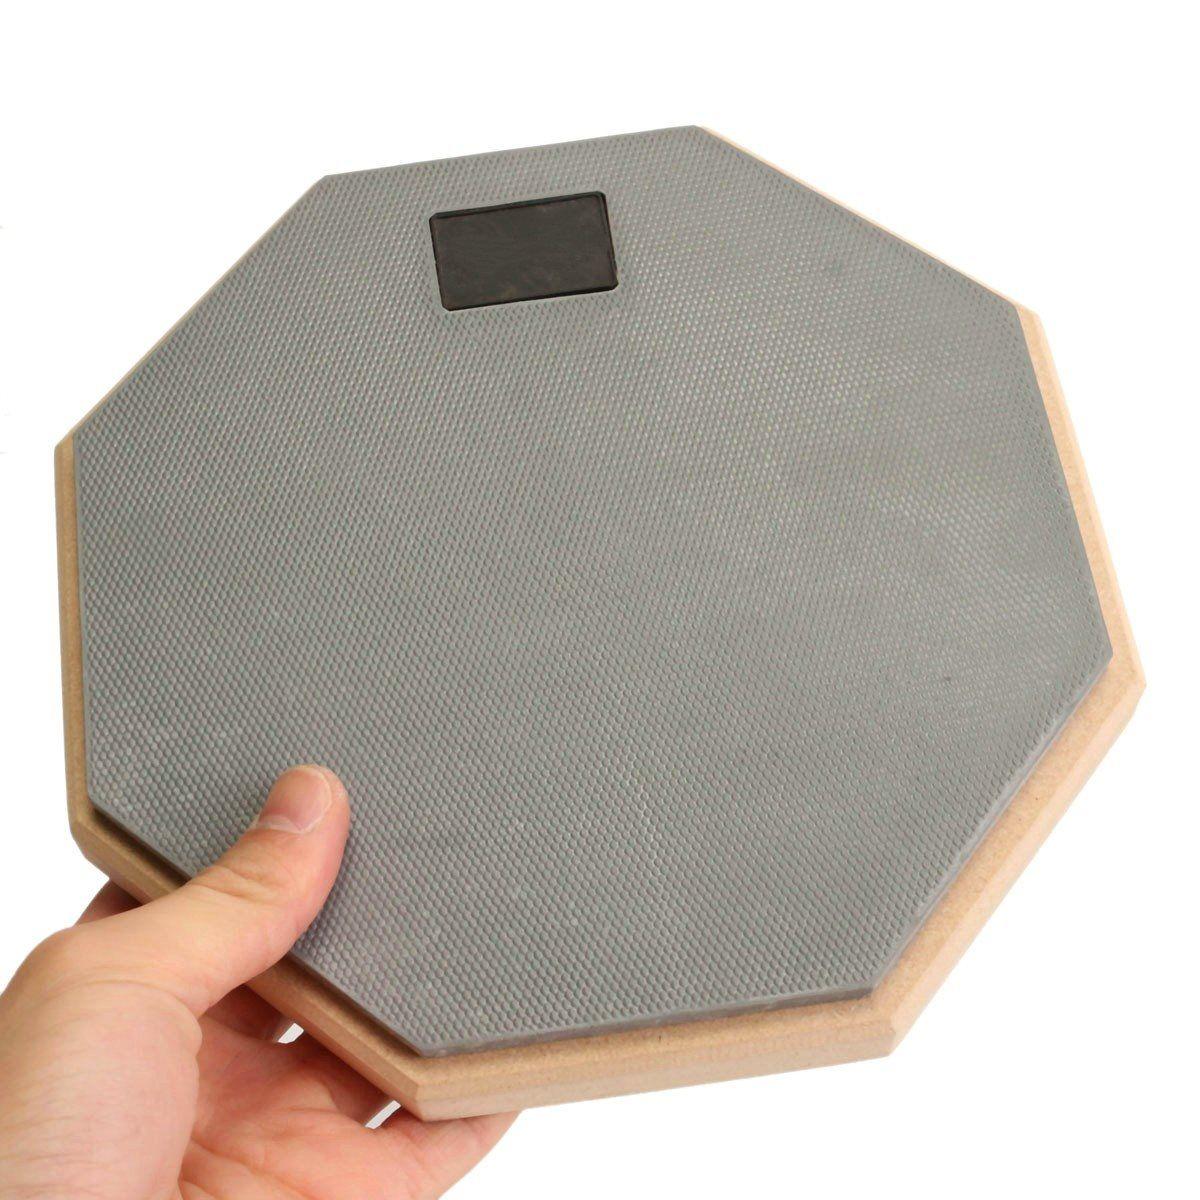 online cheap 8 inch rubber wooden dumb drum silent practice drumpad for beginner drumming quiet. Black Bedroom Furniture Sets. Home Design Ideas